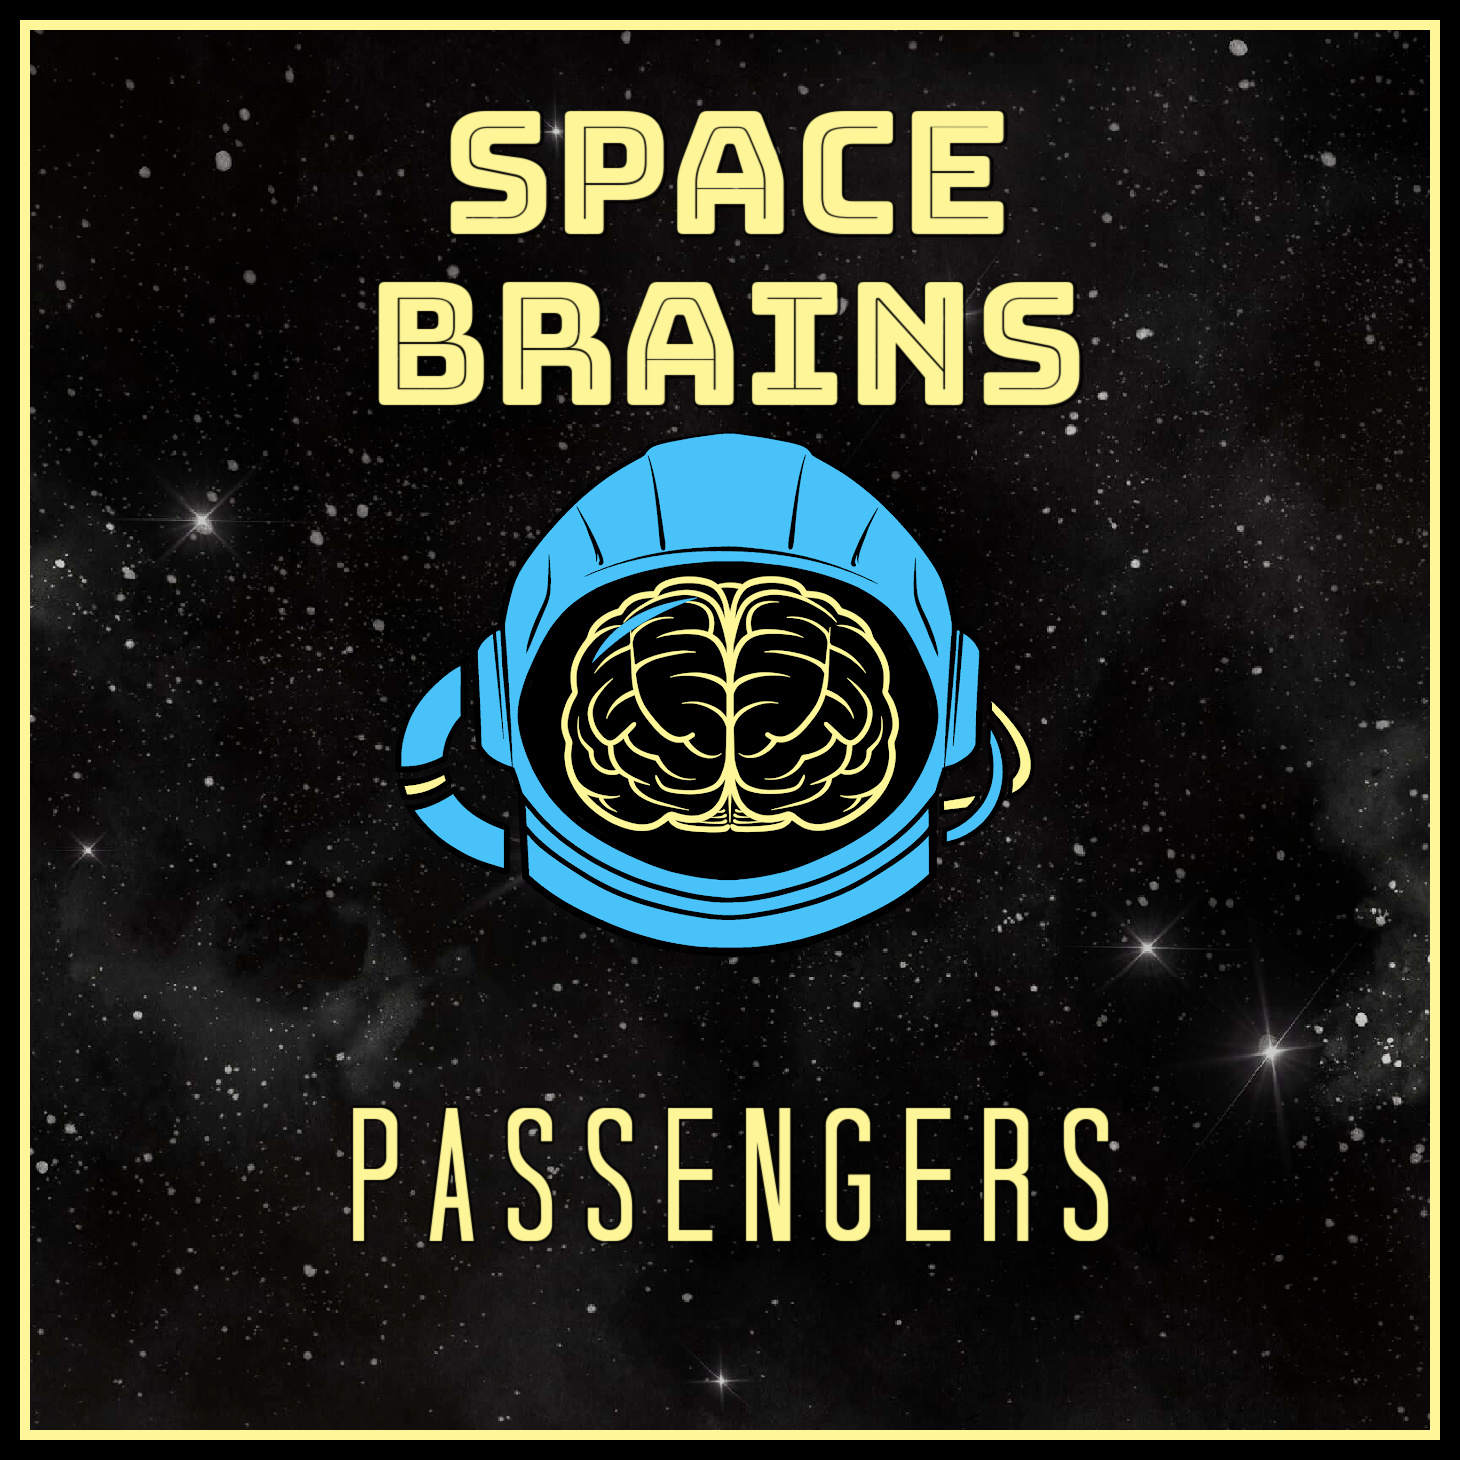 Space Brains - 1 - Passengers